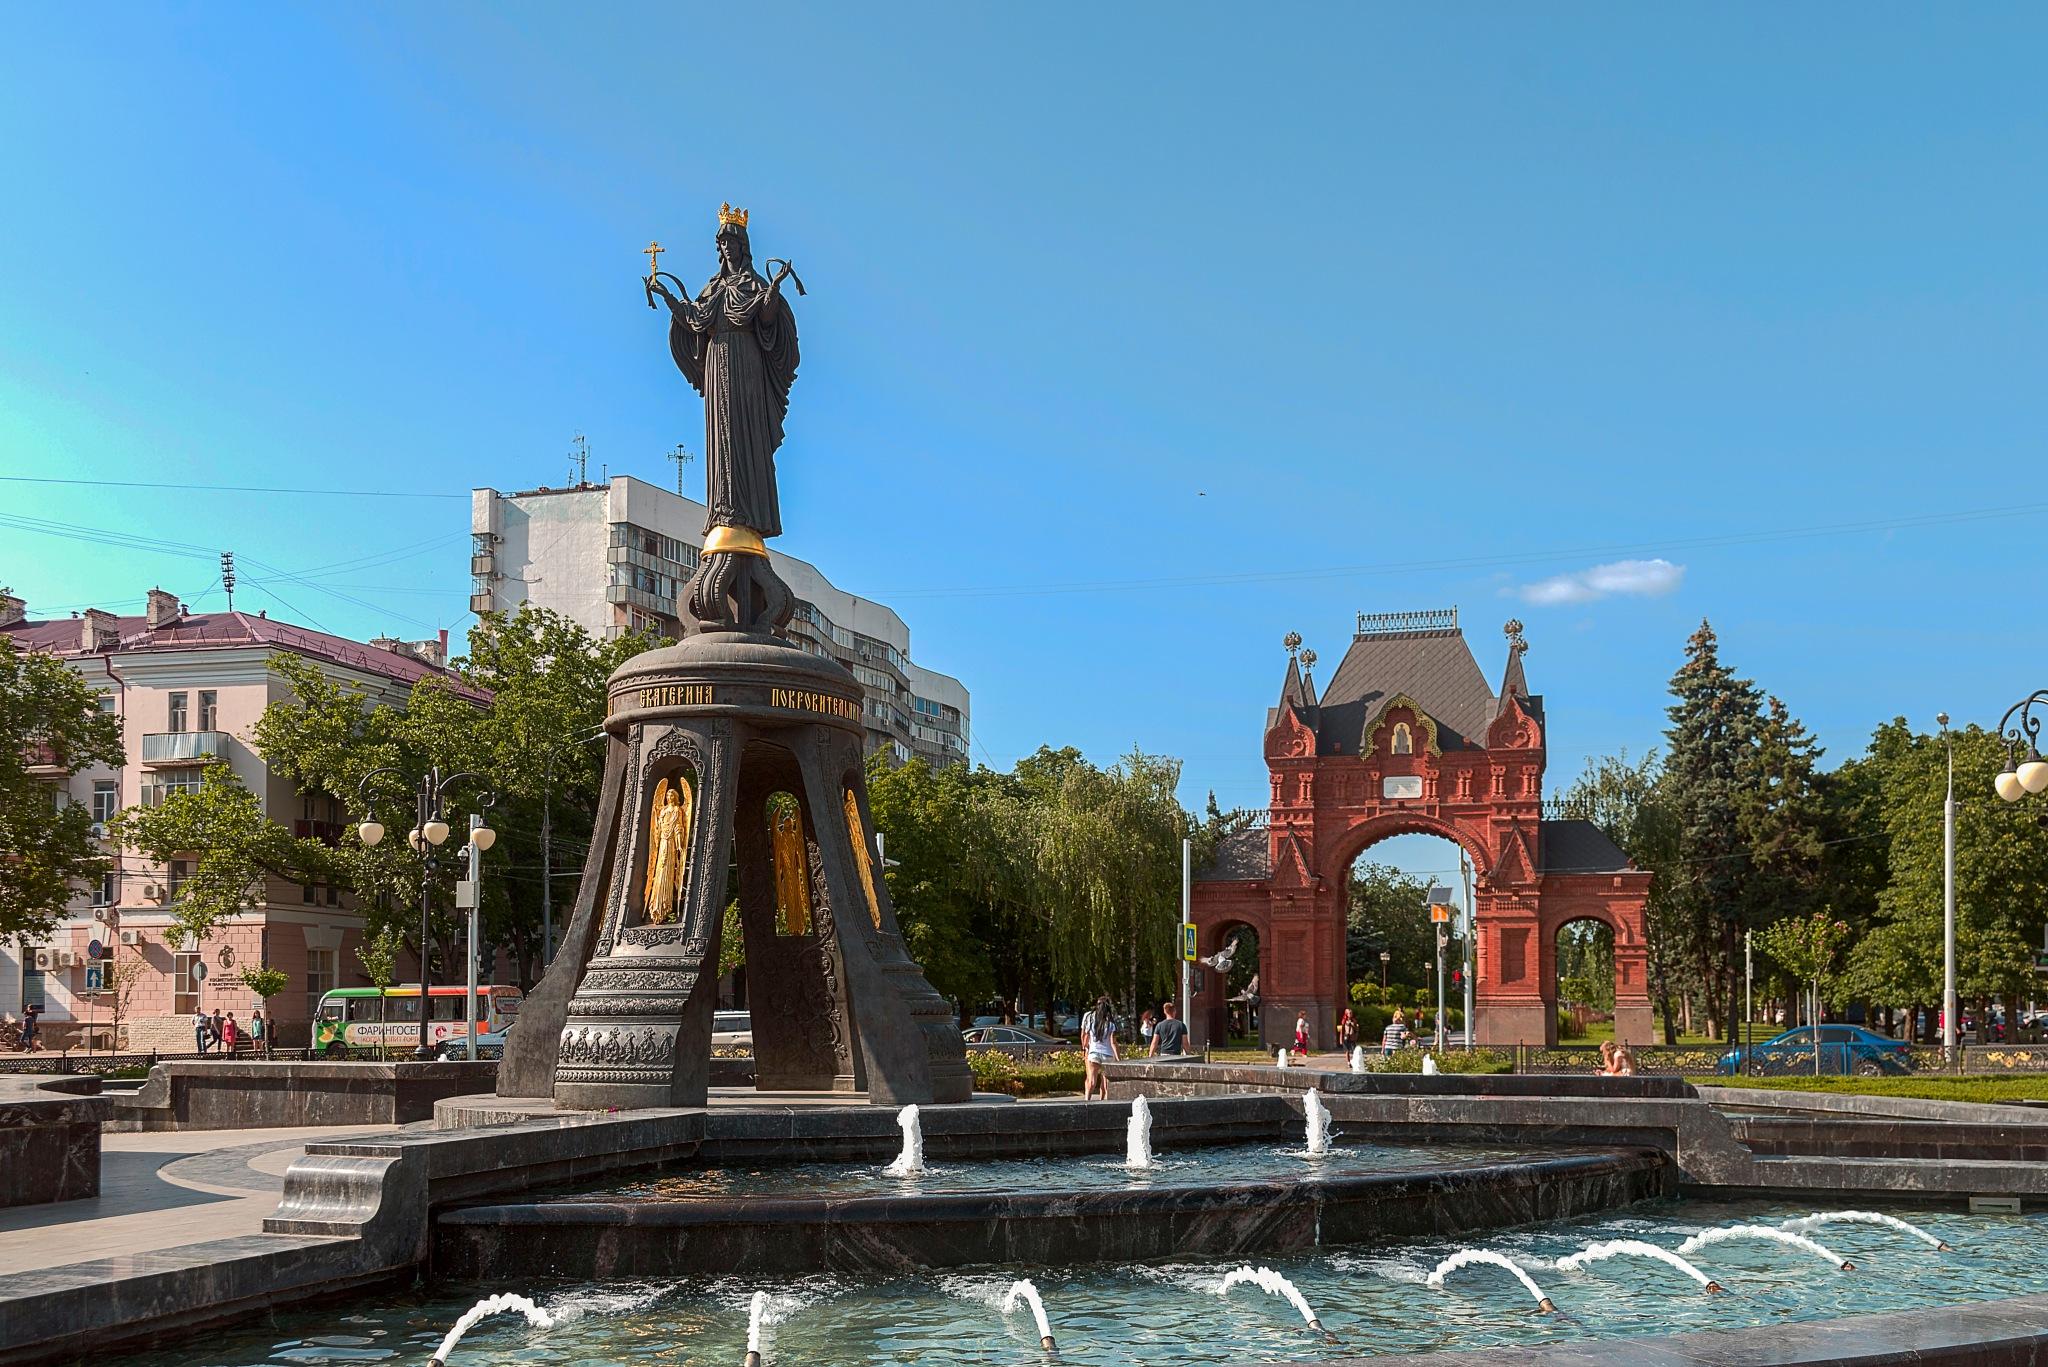 Monument SV. Catherine and Alexander triumphal arch by Igor Khizhnyak